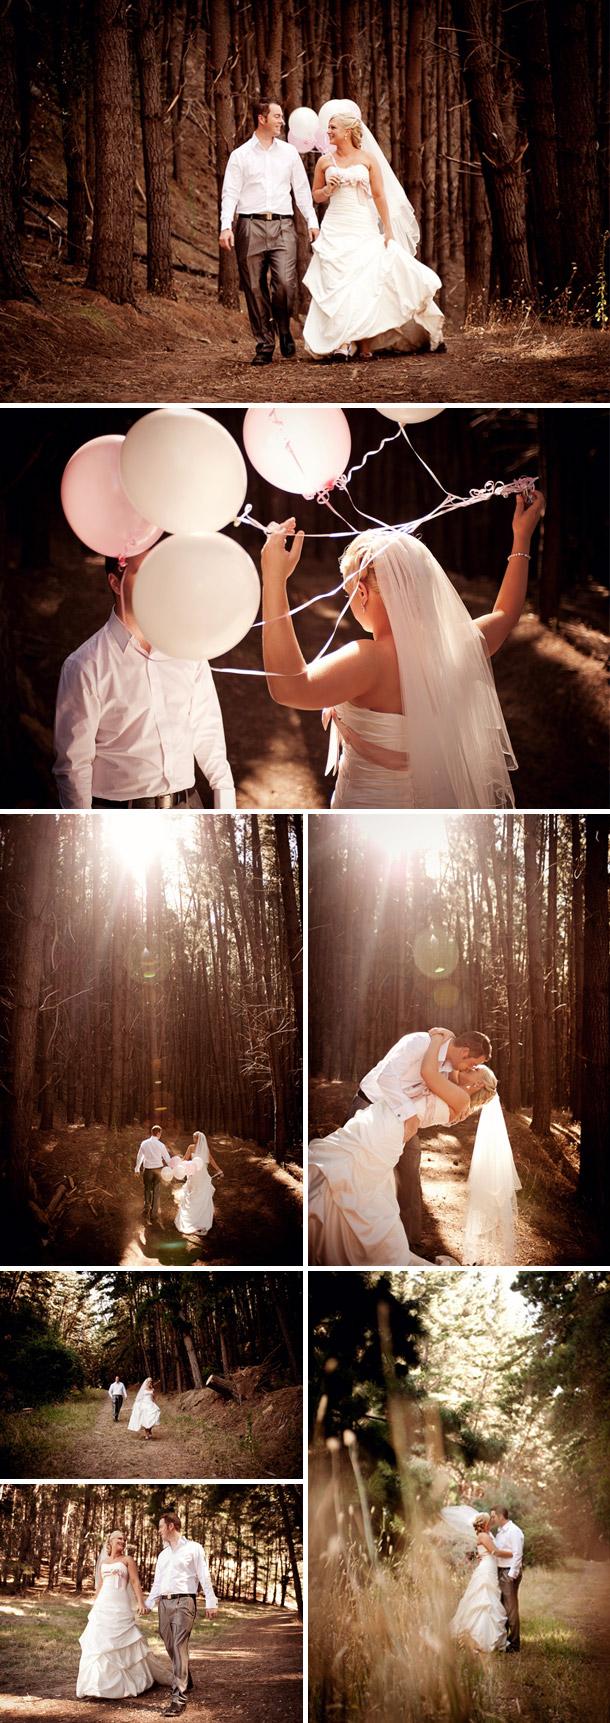 Ashleigh und Ryan - Wundervolles After-Wedding-Shooting von Angelsmith Photography